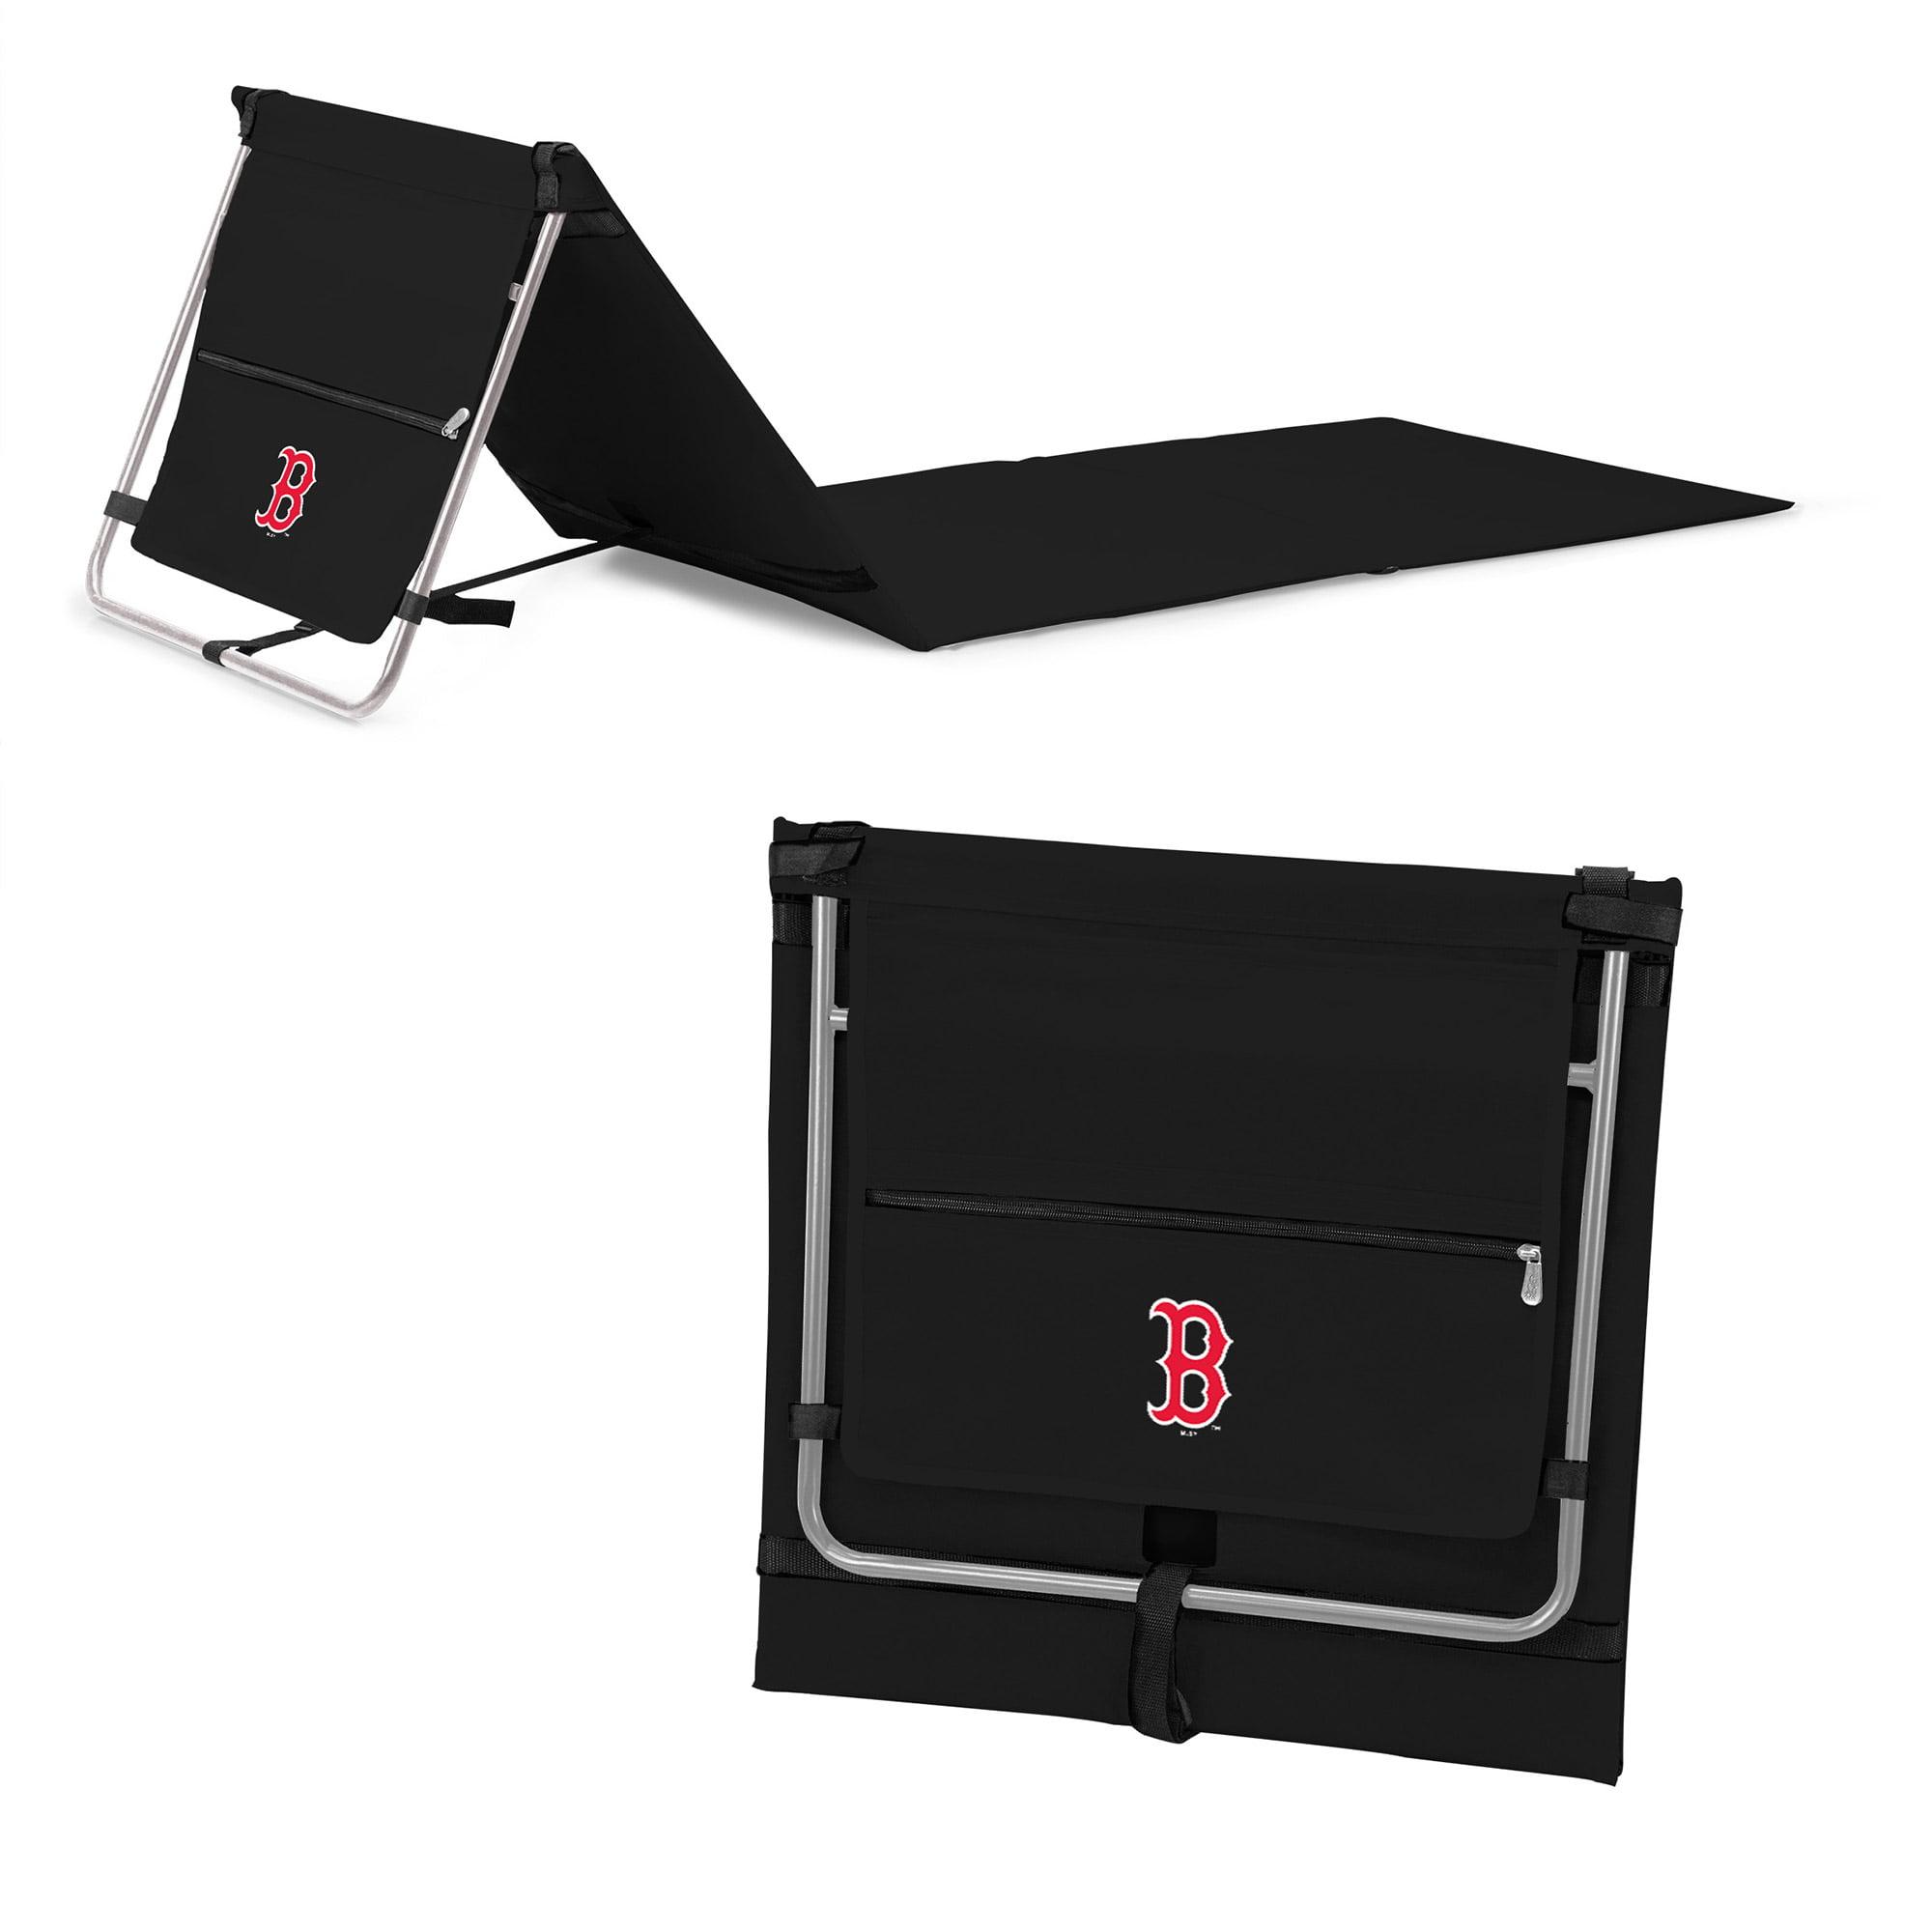 Boston Red Sox Portable Lounger Beach Mat - Black - No Size